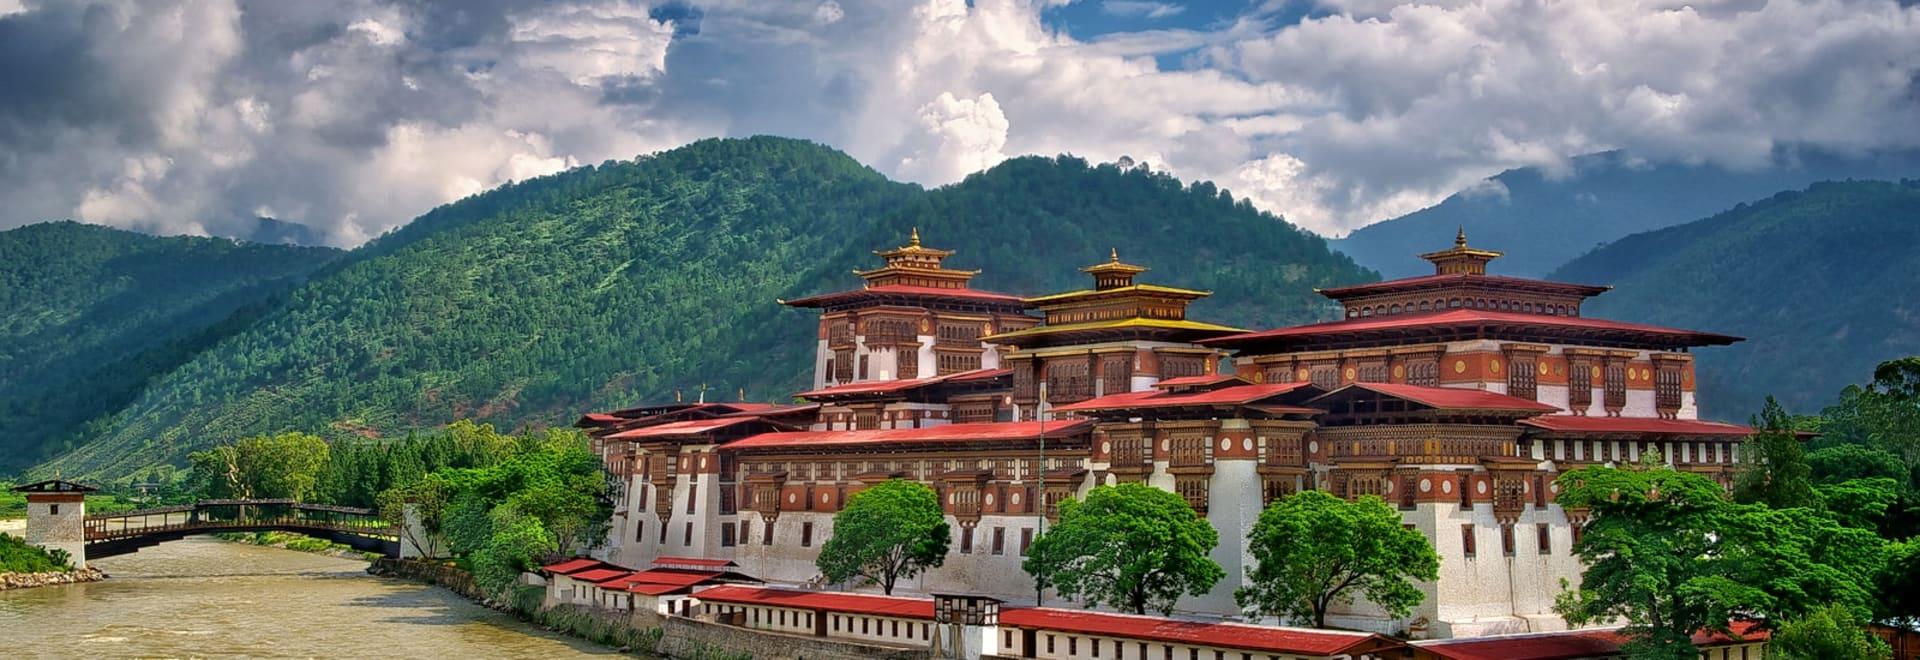 1464189226_punakha-dzong.jpg